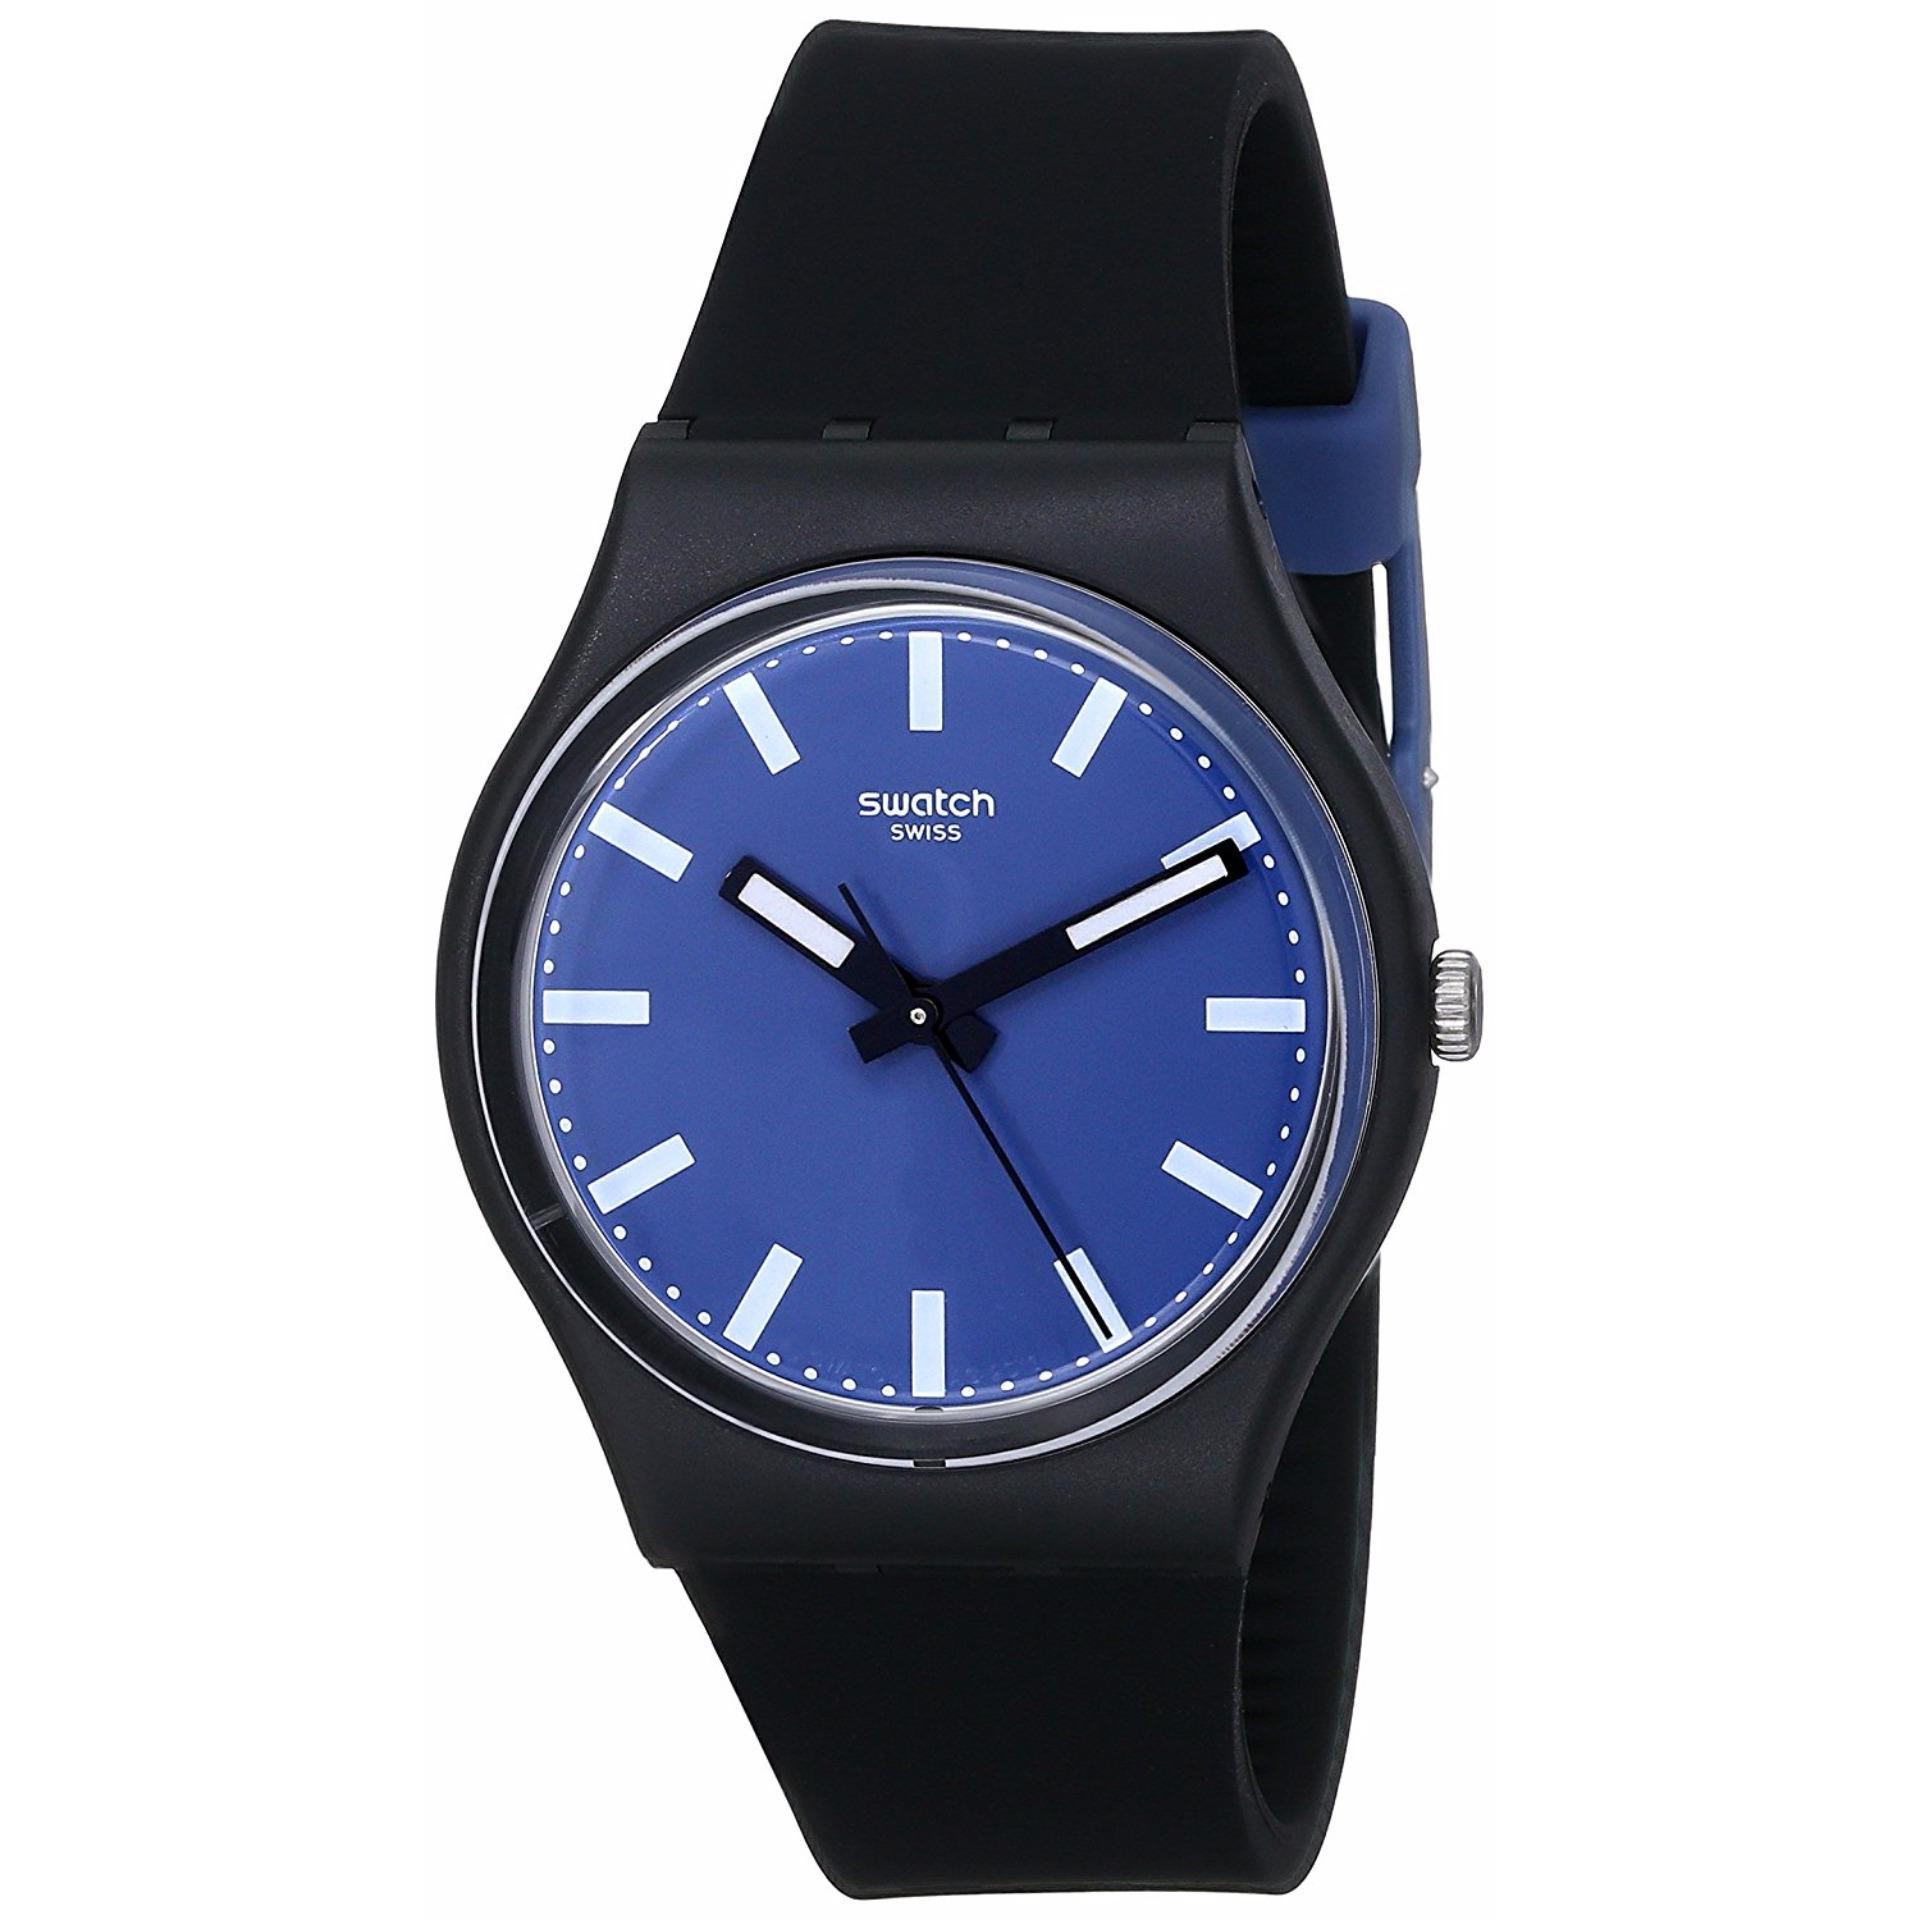 Swatch Yos455g Blue Maximus Chronograph Tachymeter Jamtangan Pria Jam Tangan Original Yvs431 Destination Roma Gb281 Night Sea Analog Bahan